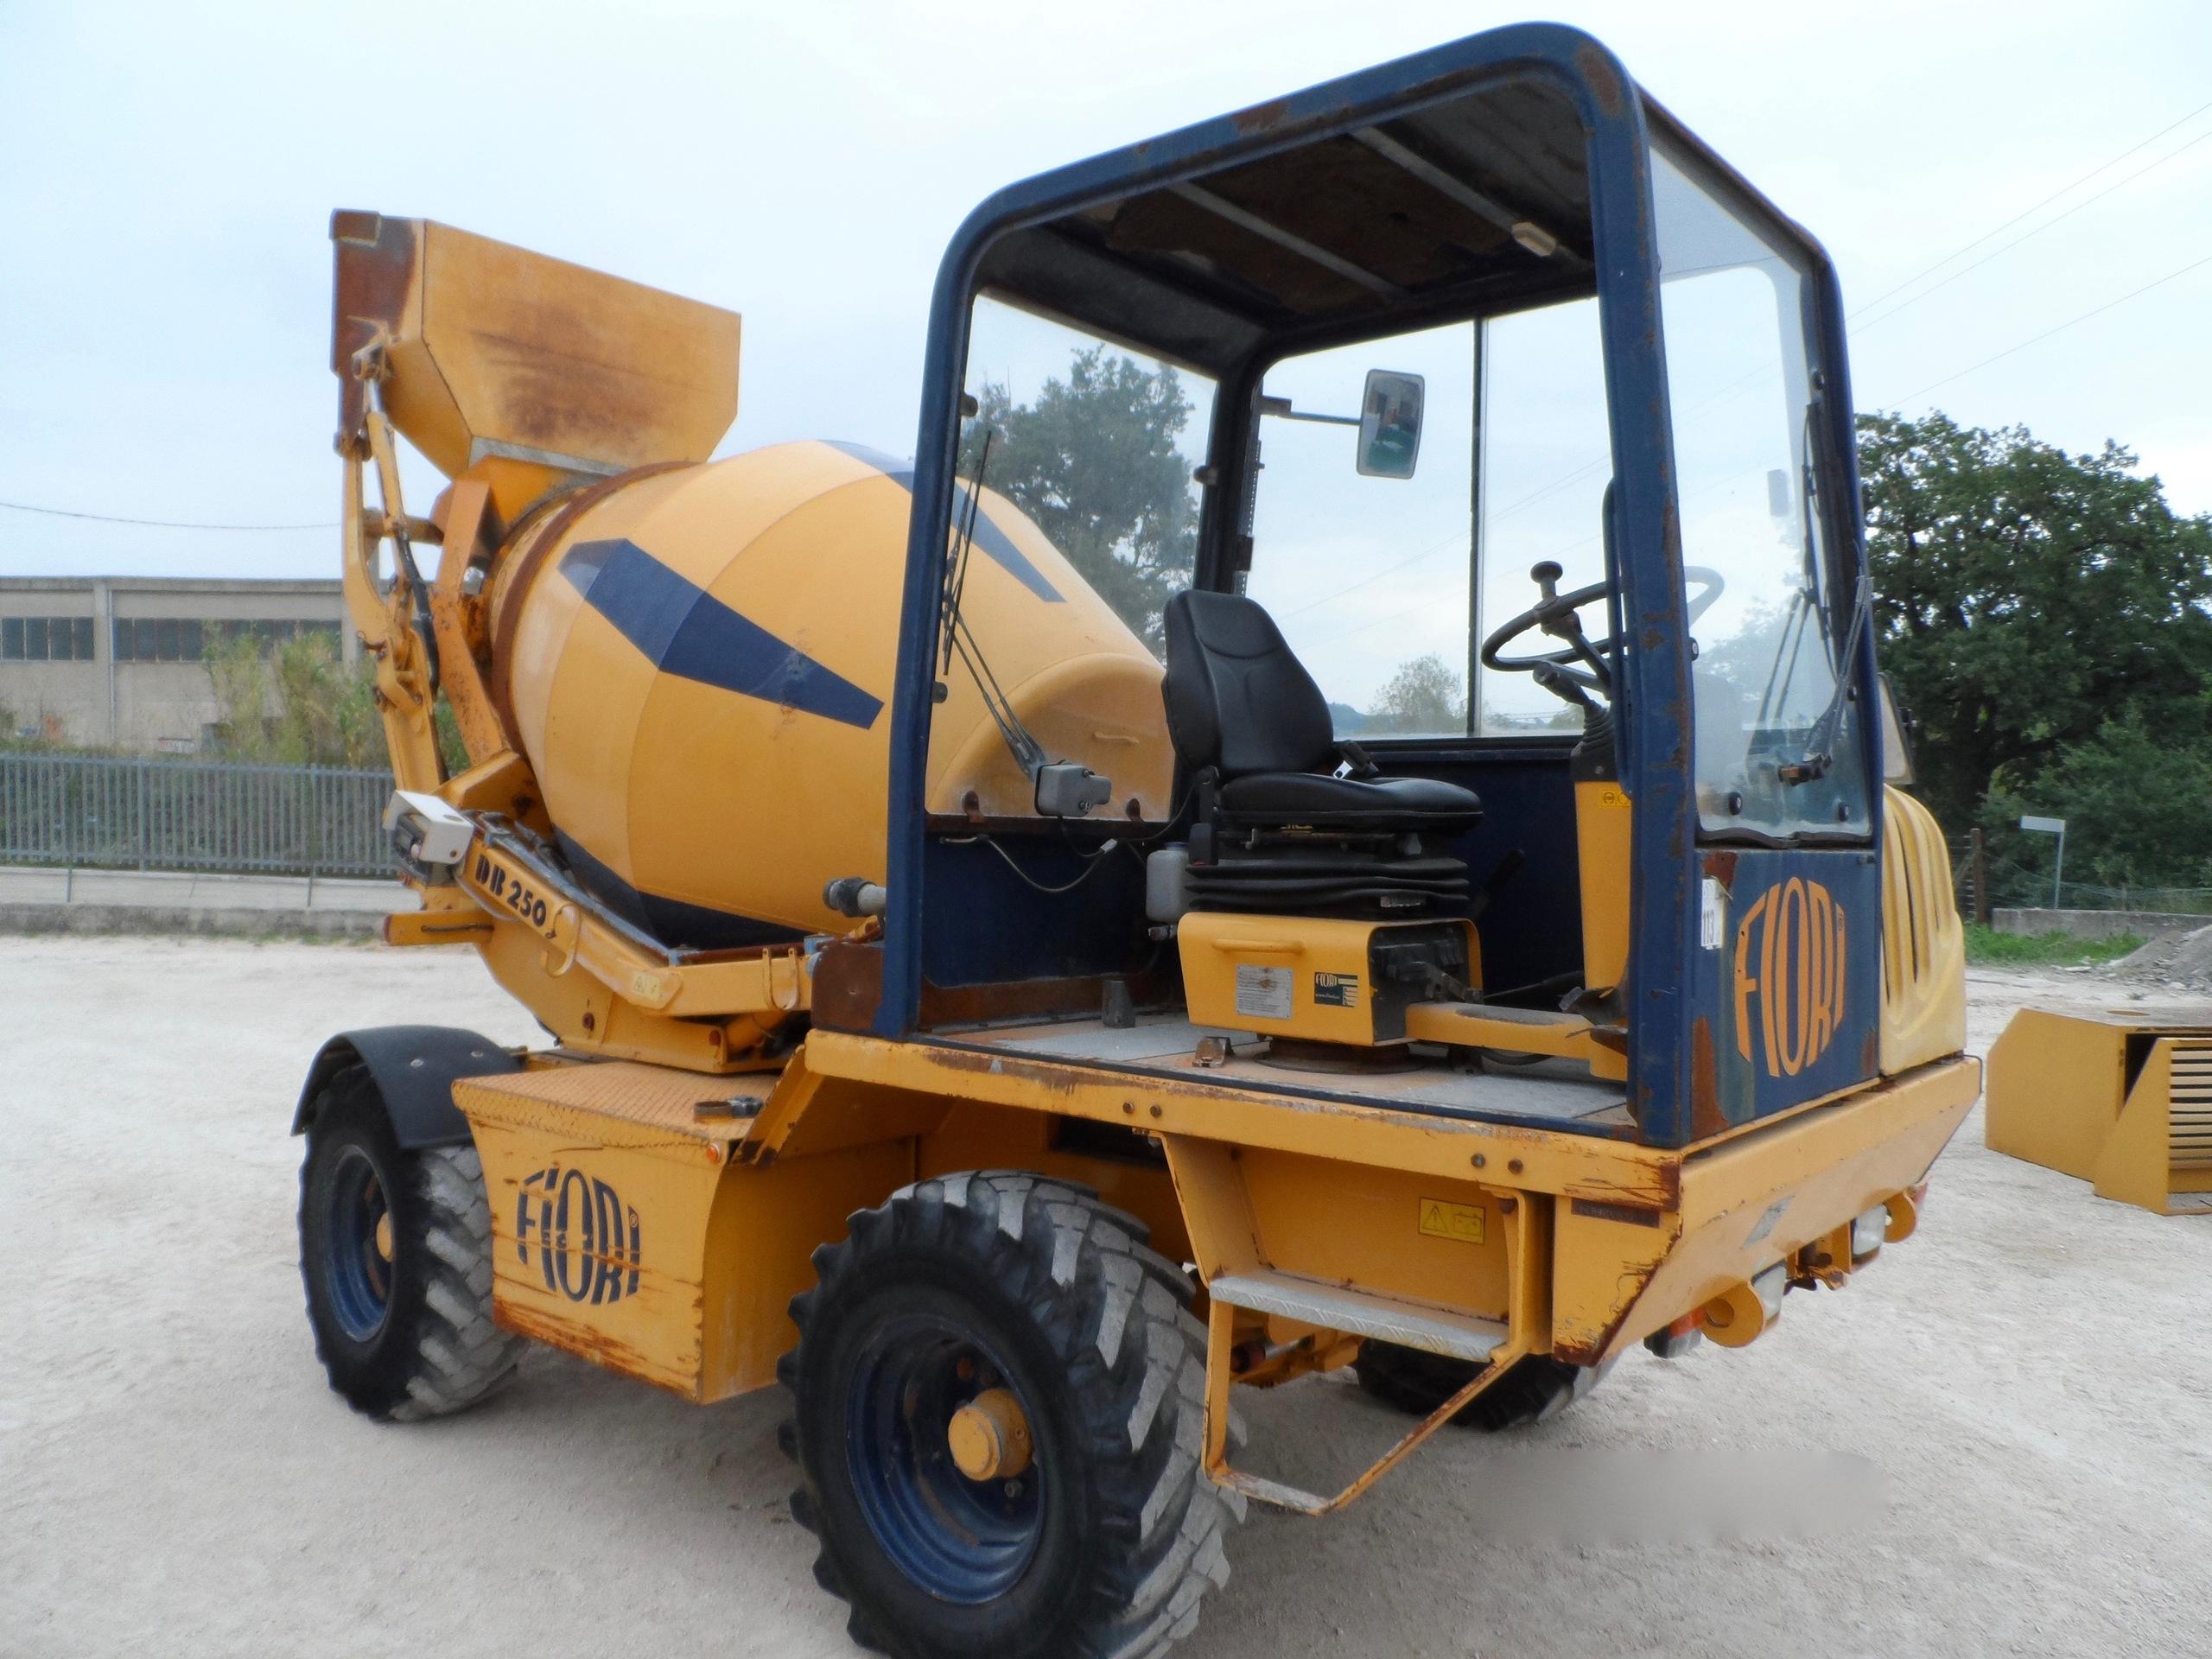 2003 - Fiori DB250S